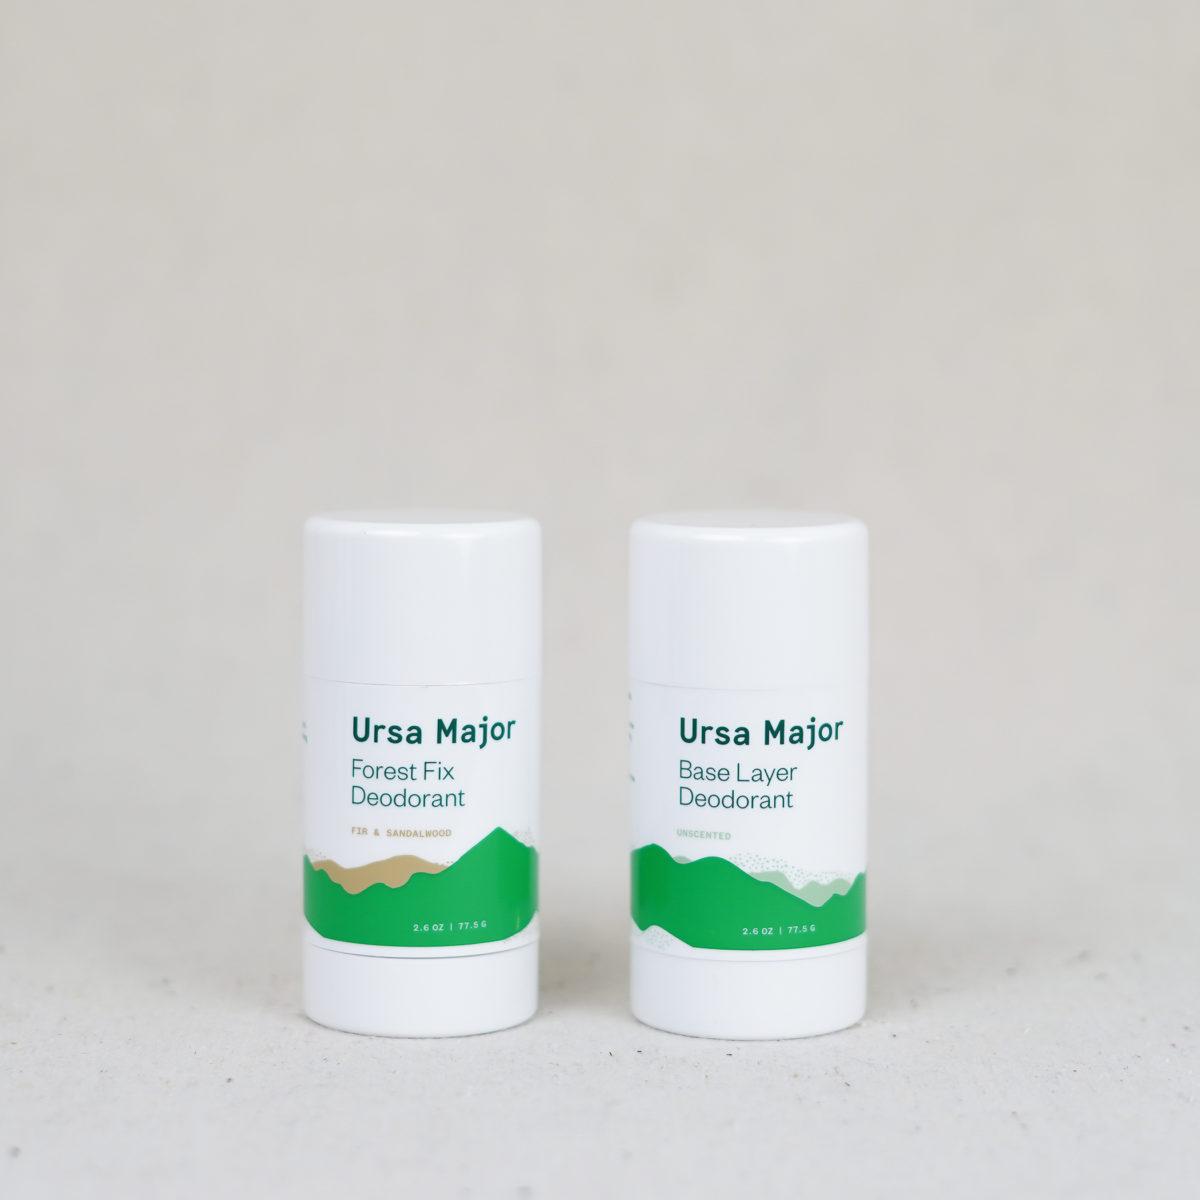 forest-fix-deodorant